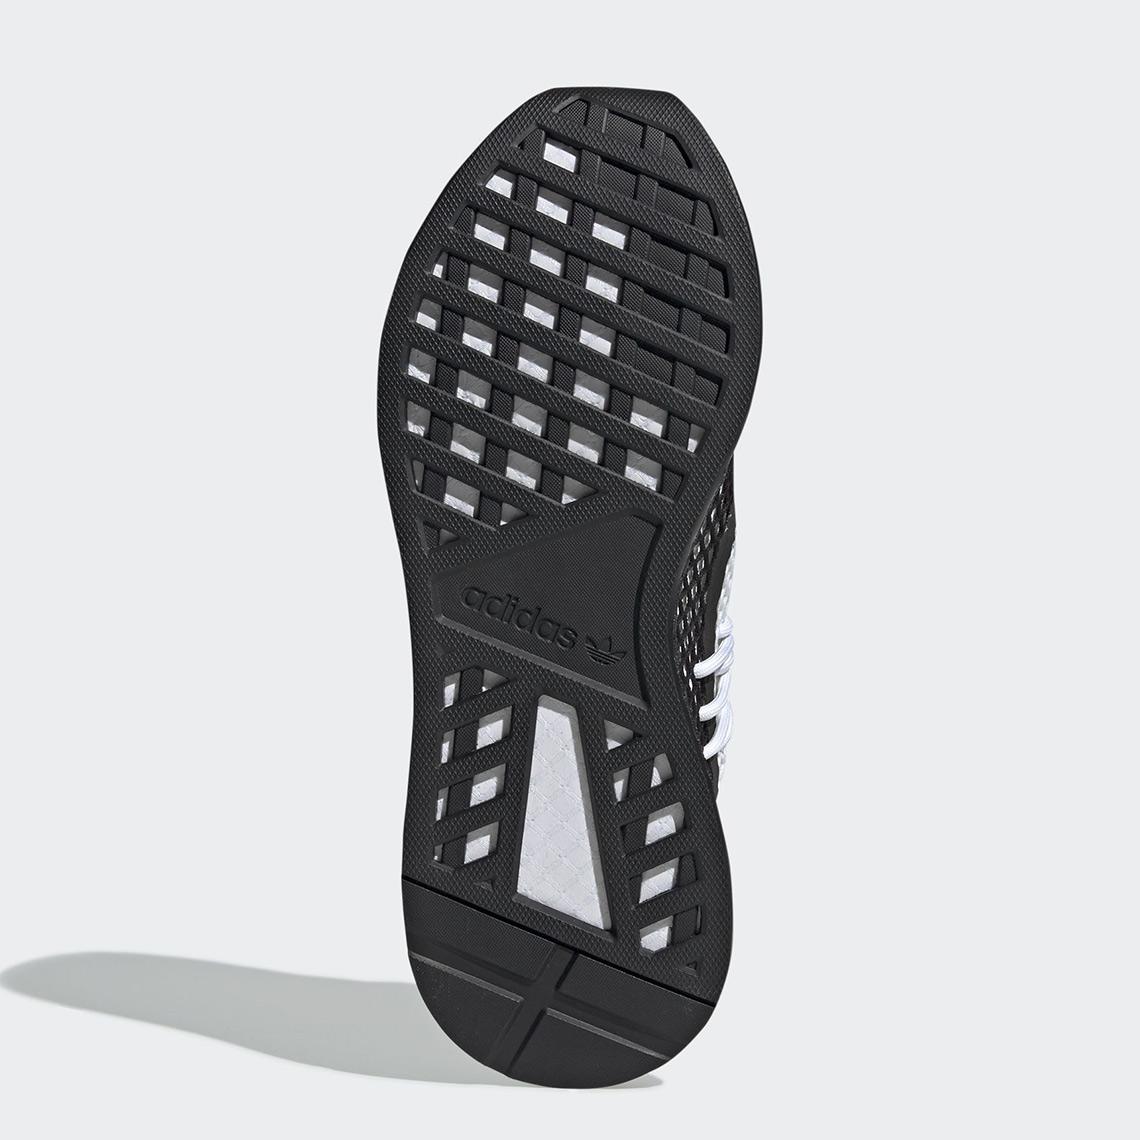 ddfe04763 adidas Deerupt S BD7875 Release Info